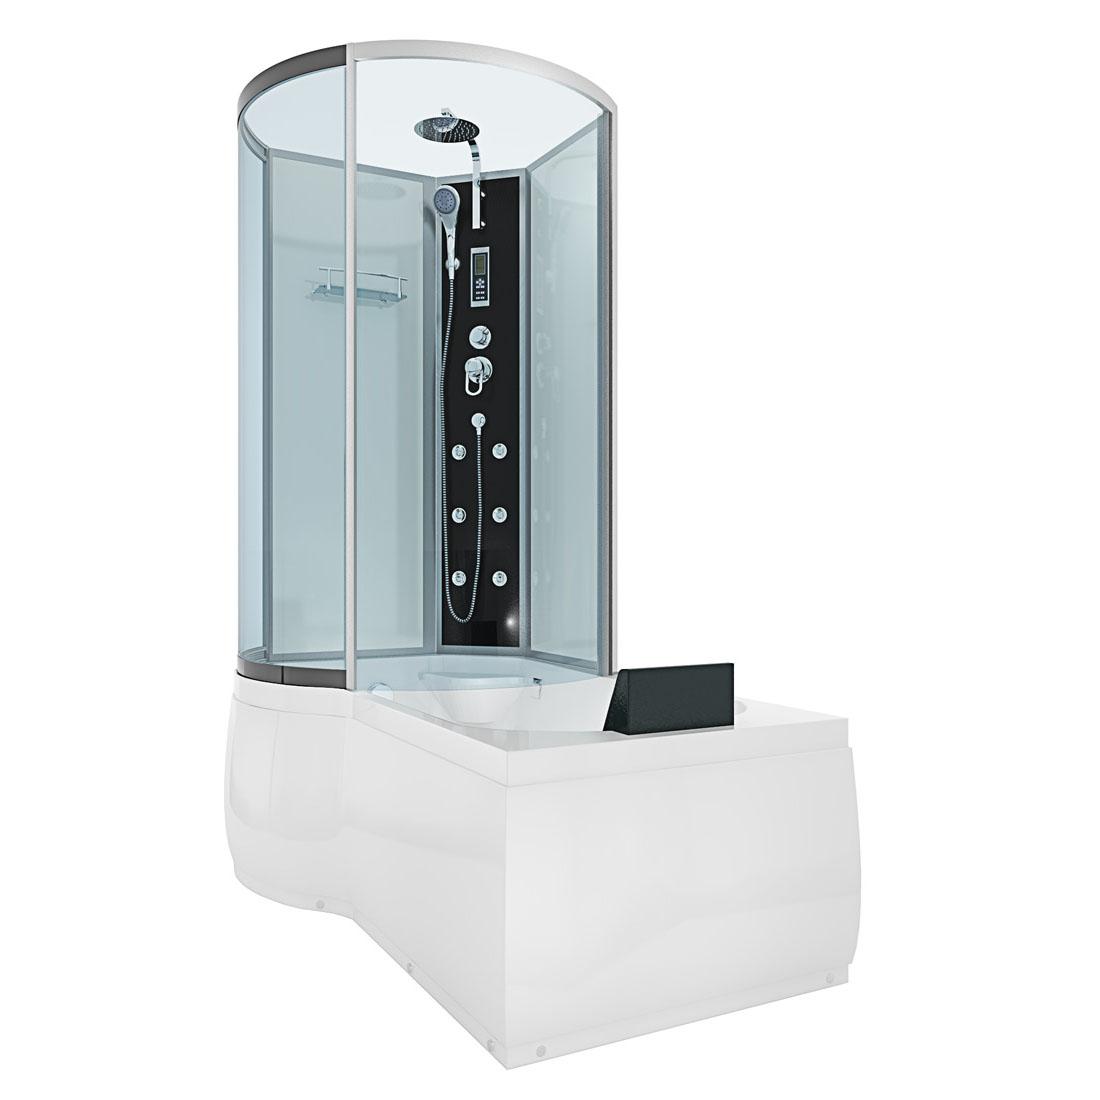 acquavapore dtp8050 a001r dusch wannen kombi in 98x170cm trendbad24. Black Bedroom Furniture Sets. Home Design Ideas